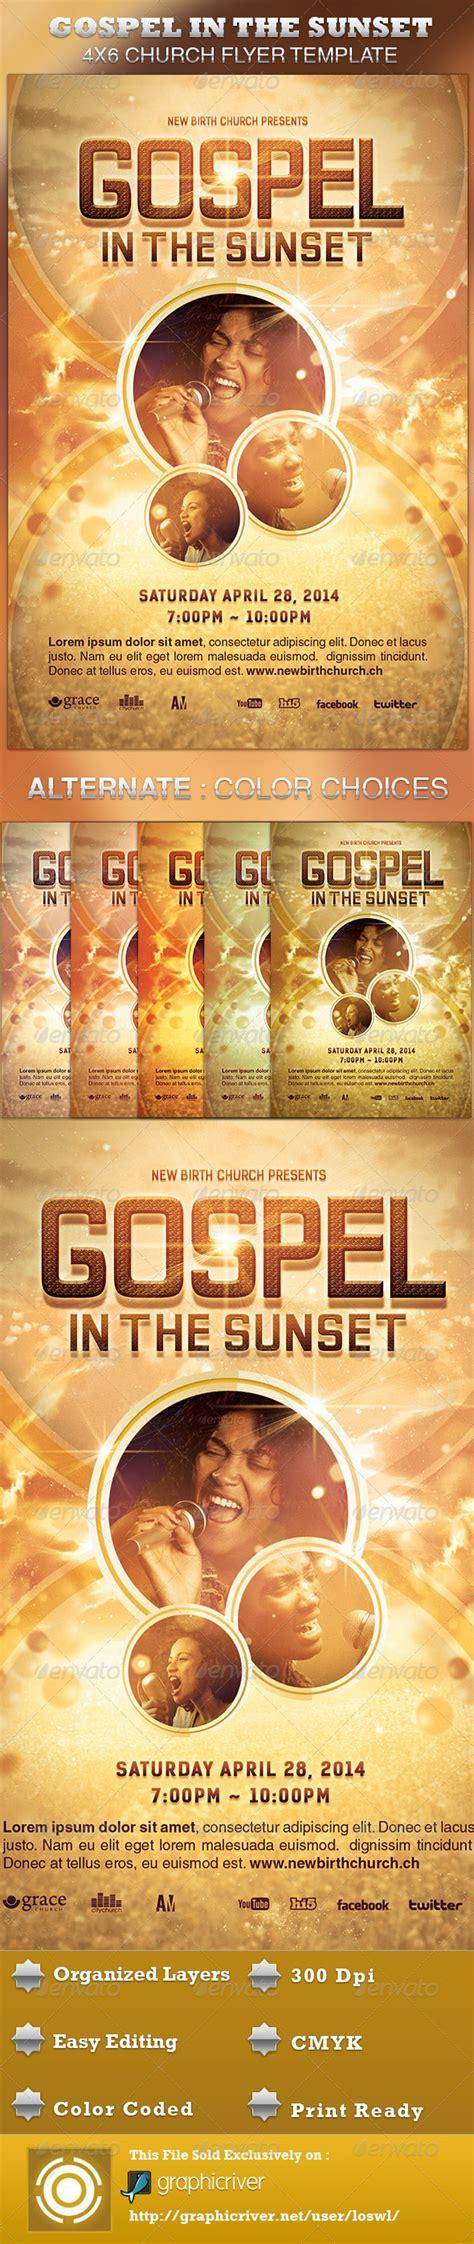 Print Templates Gospel In The Sunset Church Flyer Template Graphicriver Graphicriver Iii Flyer Template